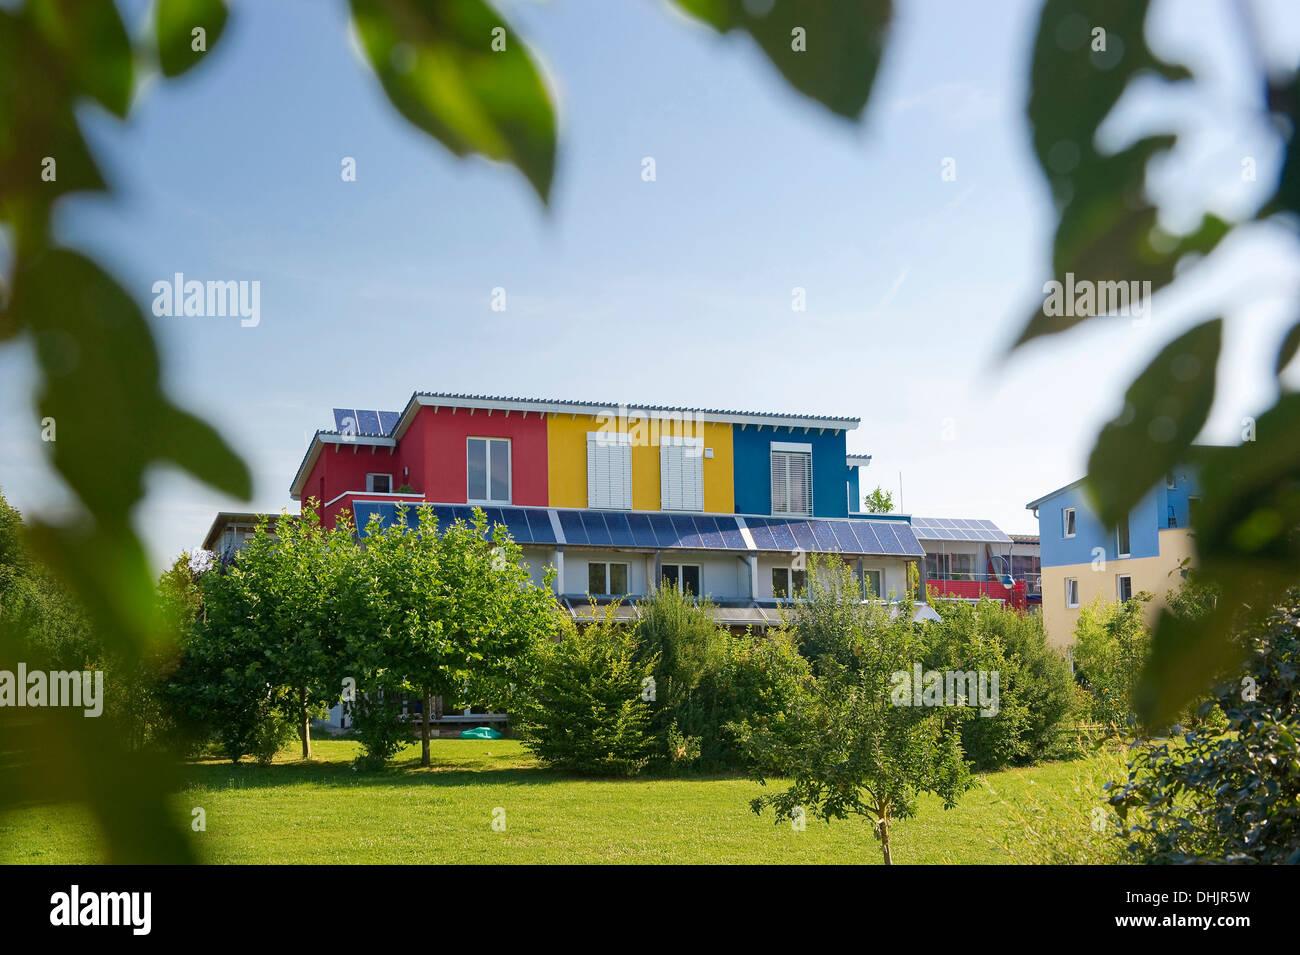 Maison passive dans le quartier Rieselfeld, Freiburg im Breisgau, Forêt-Noire, Bade-Wurtemberg, Allemagne, Europe Photo Stock